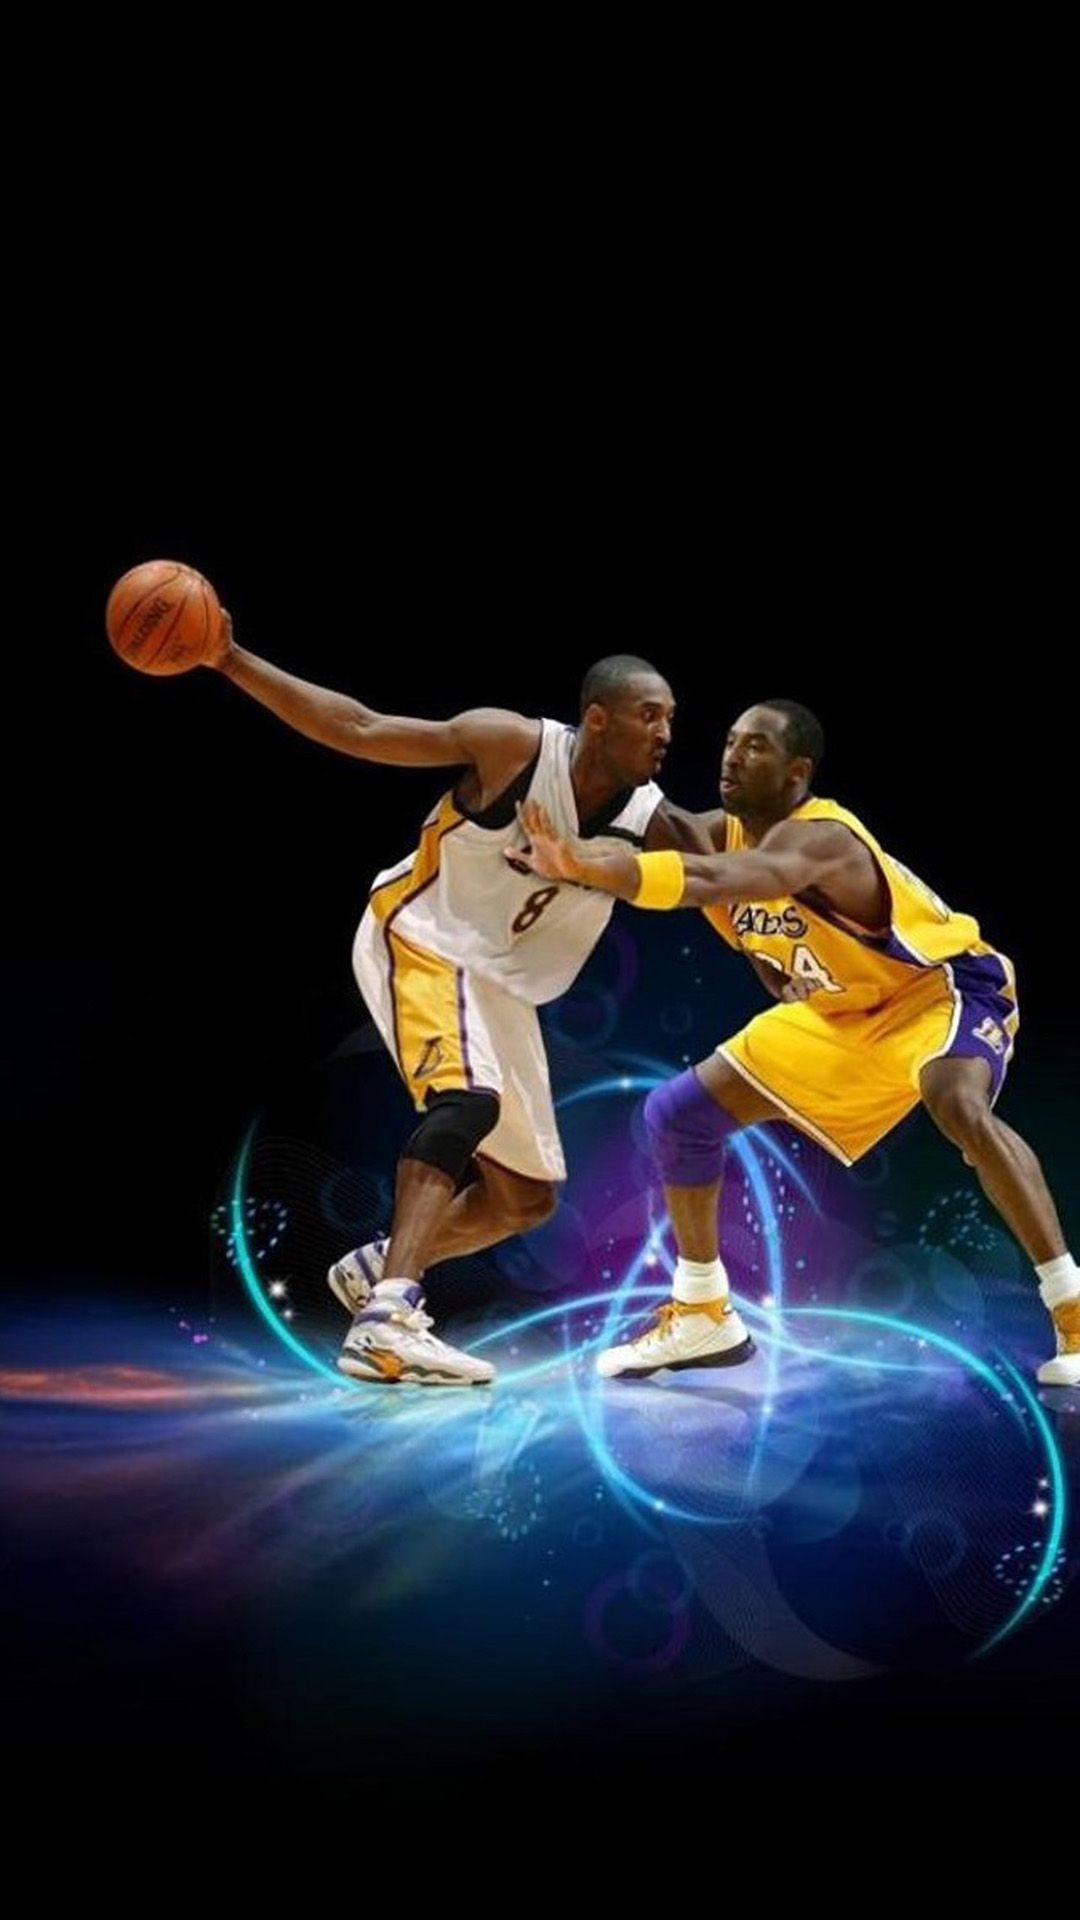 Sports Wallpaper Ios Kobe Bryant Wallpaper Kobe Bryant Kobe Bryant Wallpapers